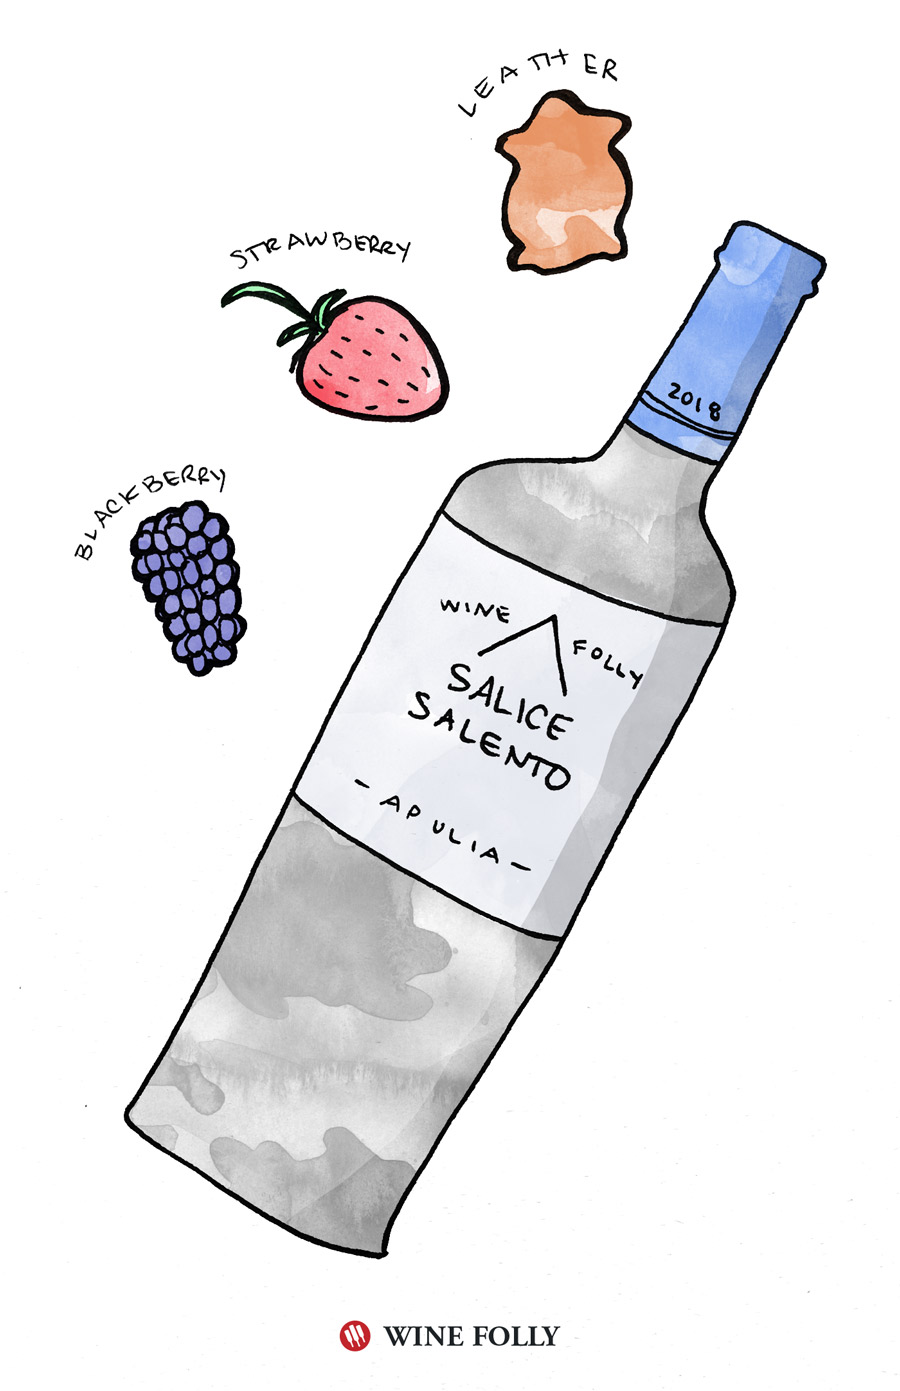 Salice Salento Tasting Notes Illustration by Wine Folly